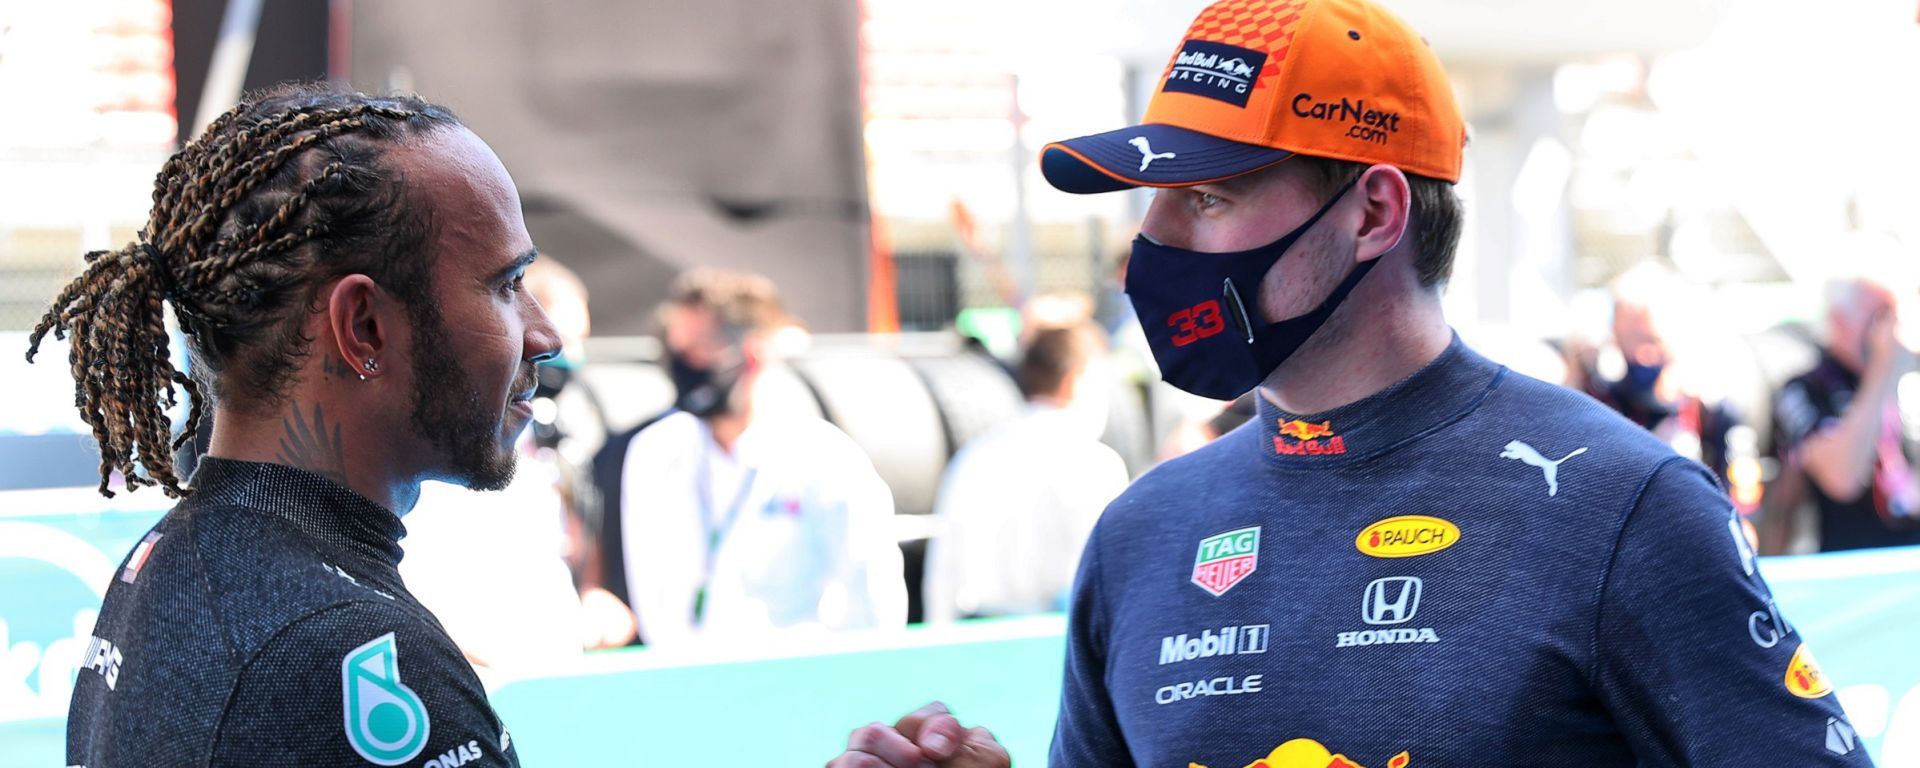 F1 2021: Lewis Hamilton e Max Verstappen